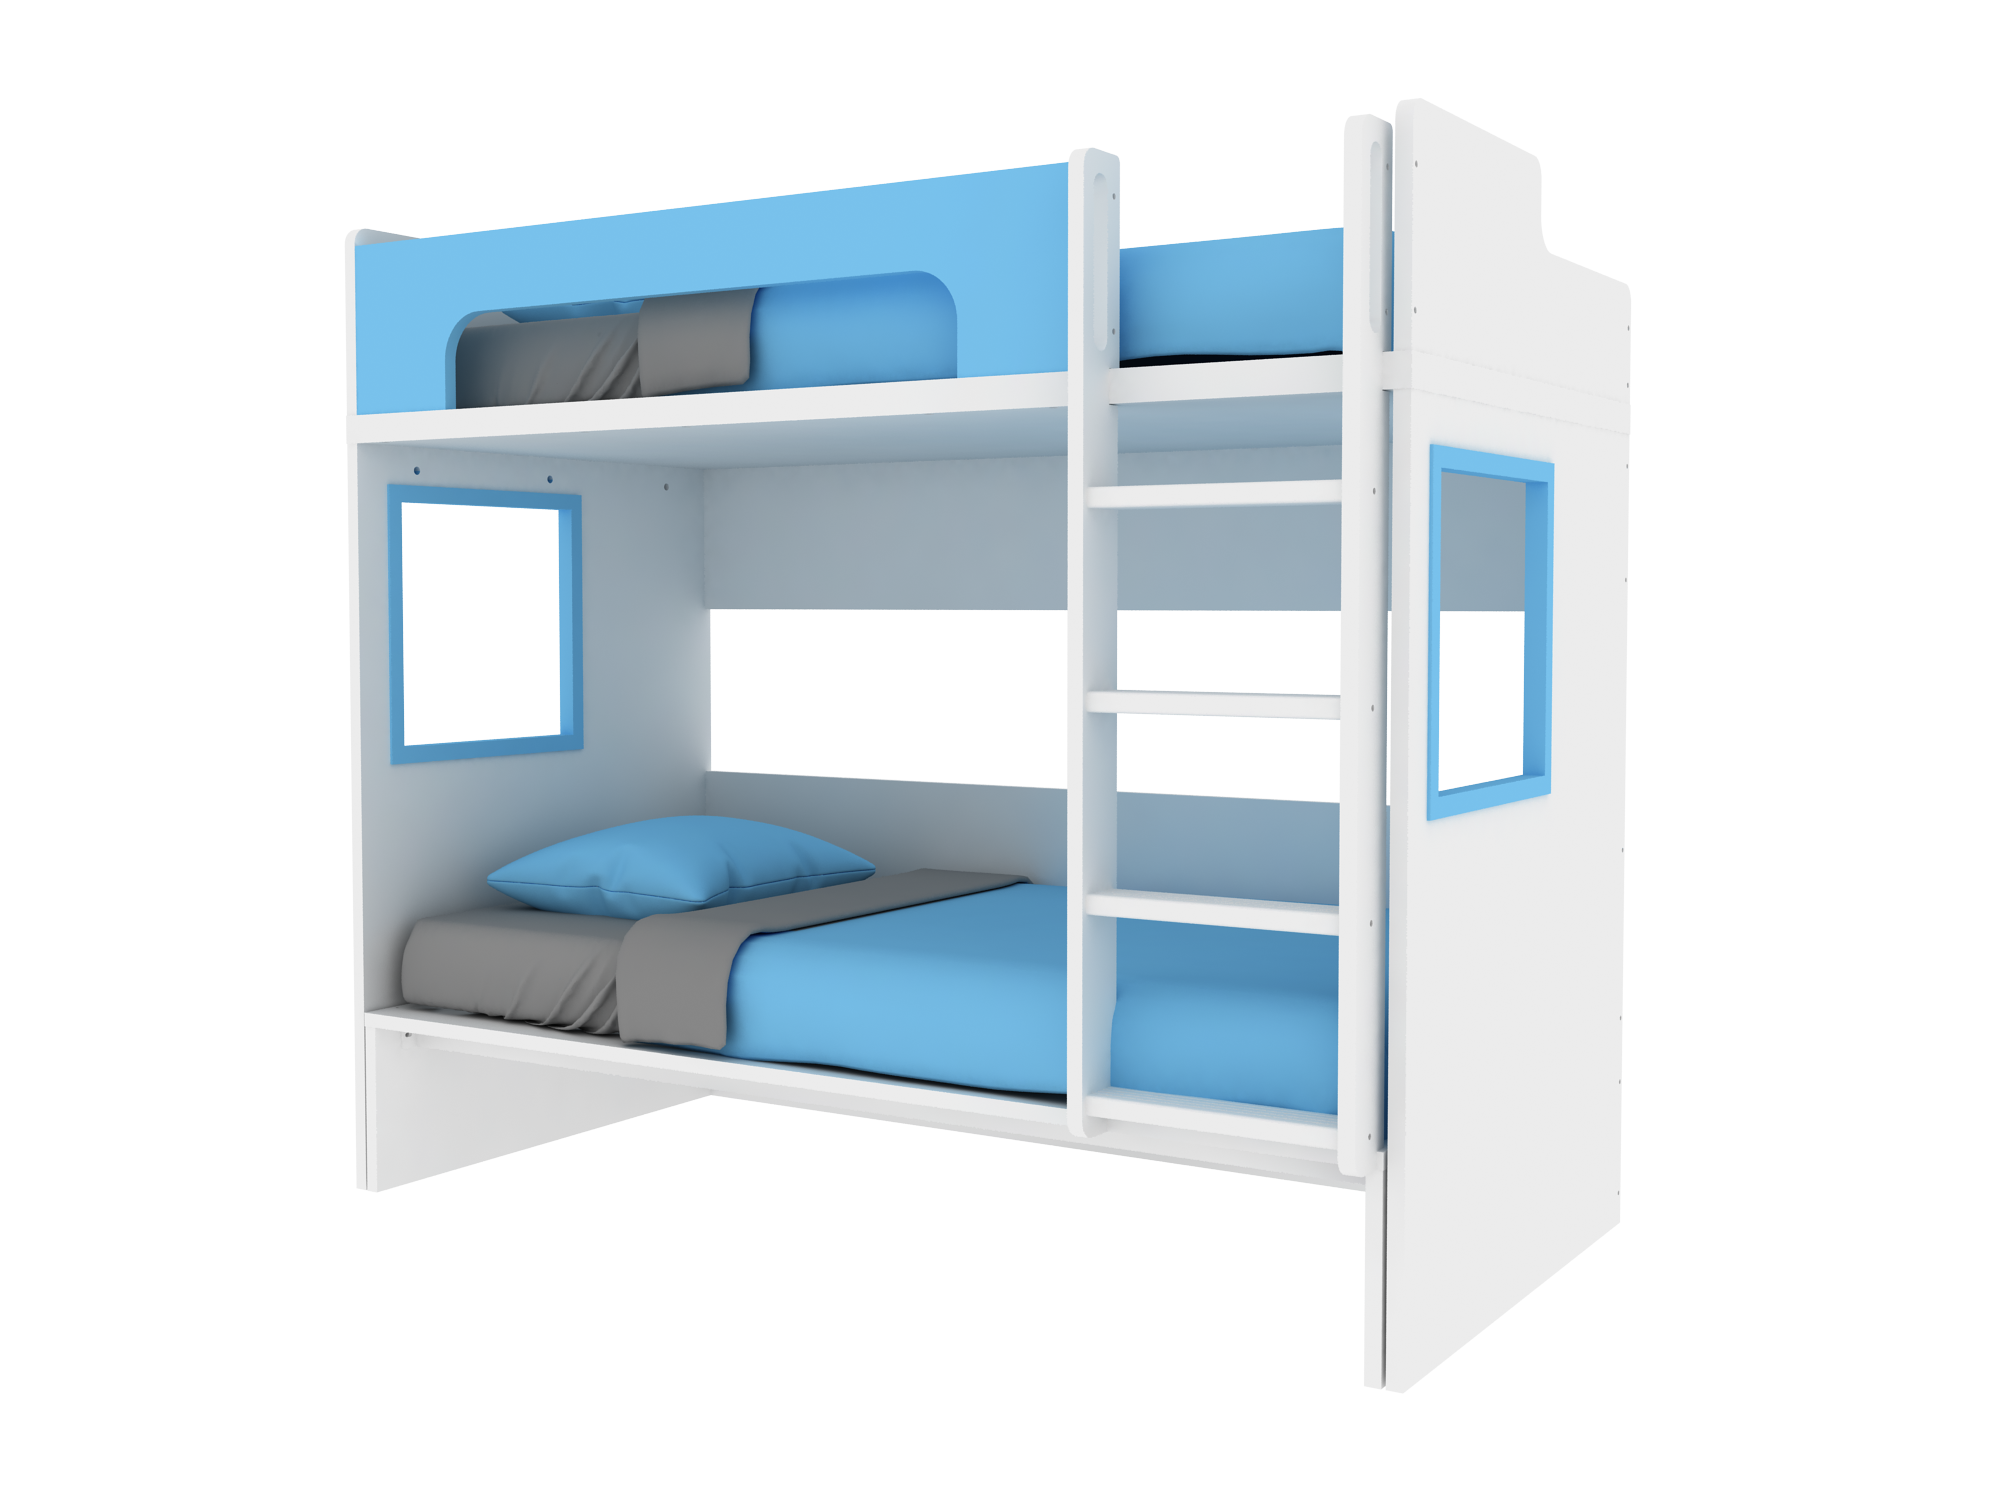 Clipart bed empty bed. Andy bunk kidz kingdom